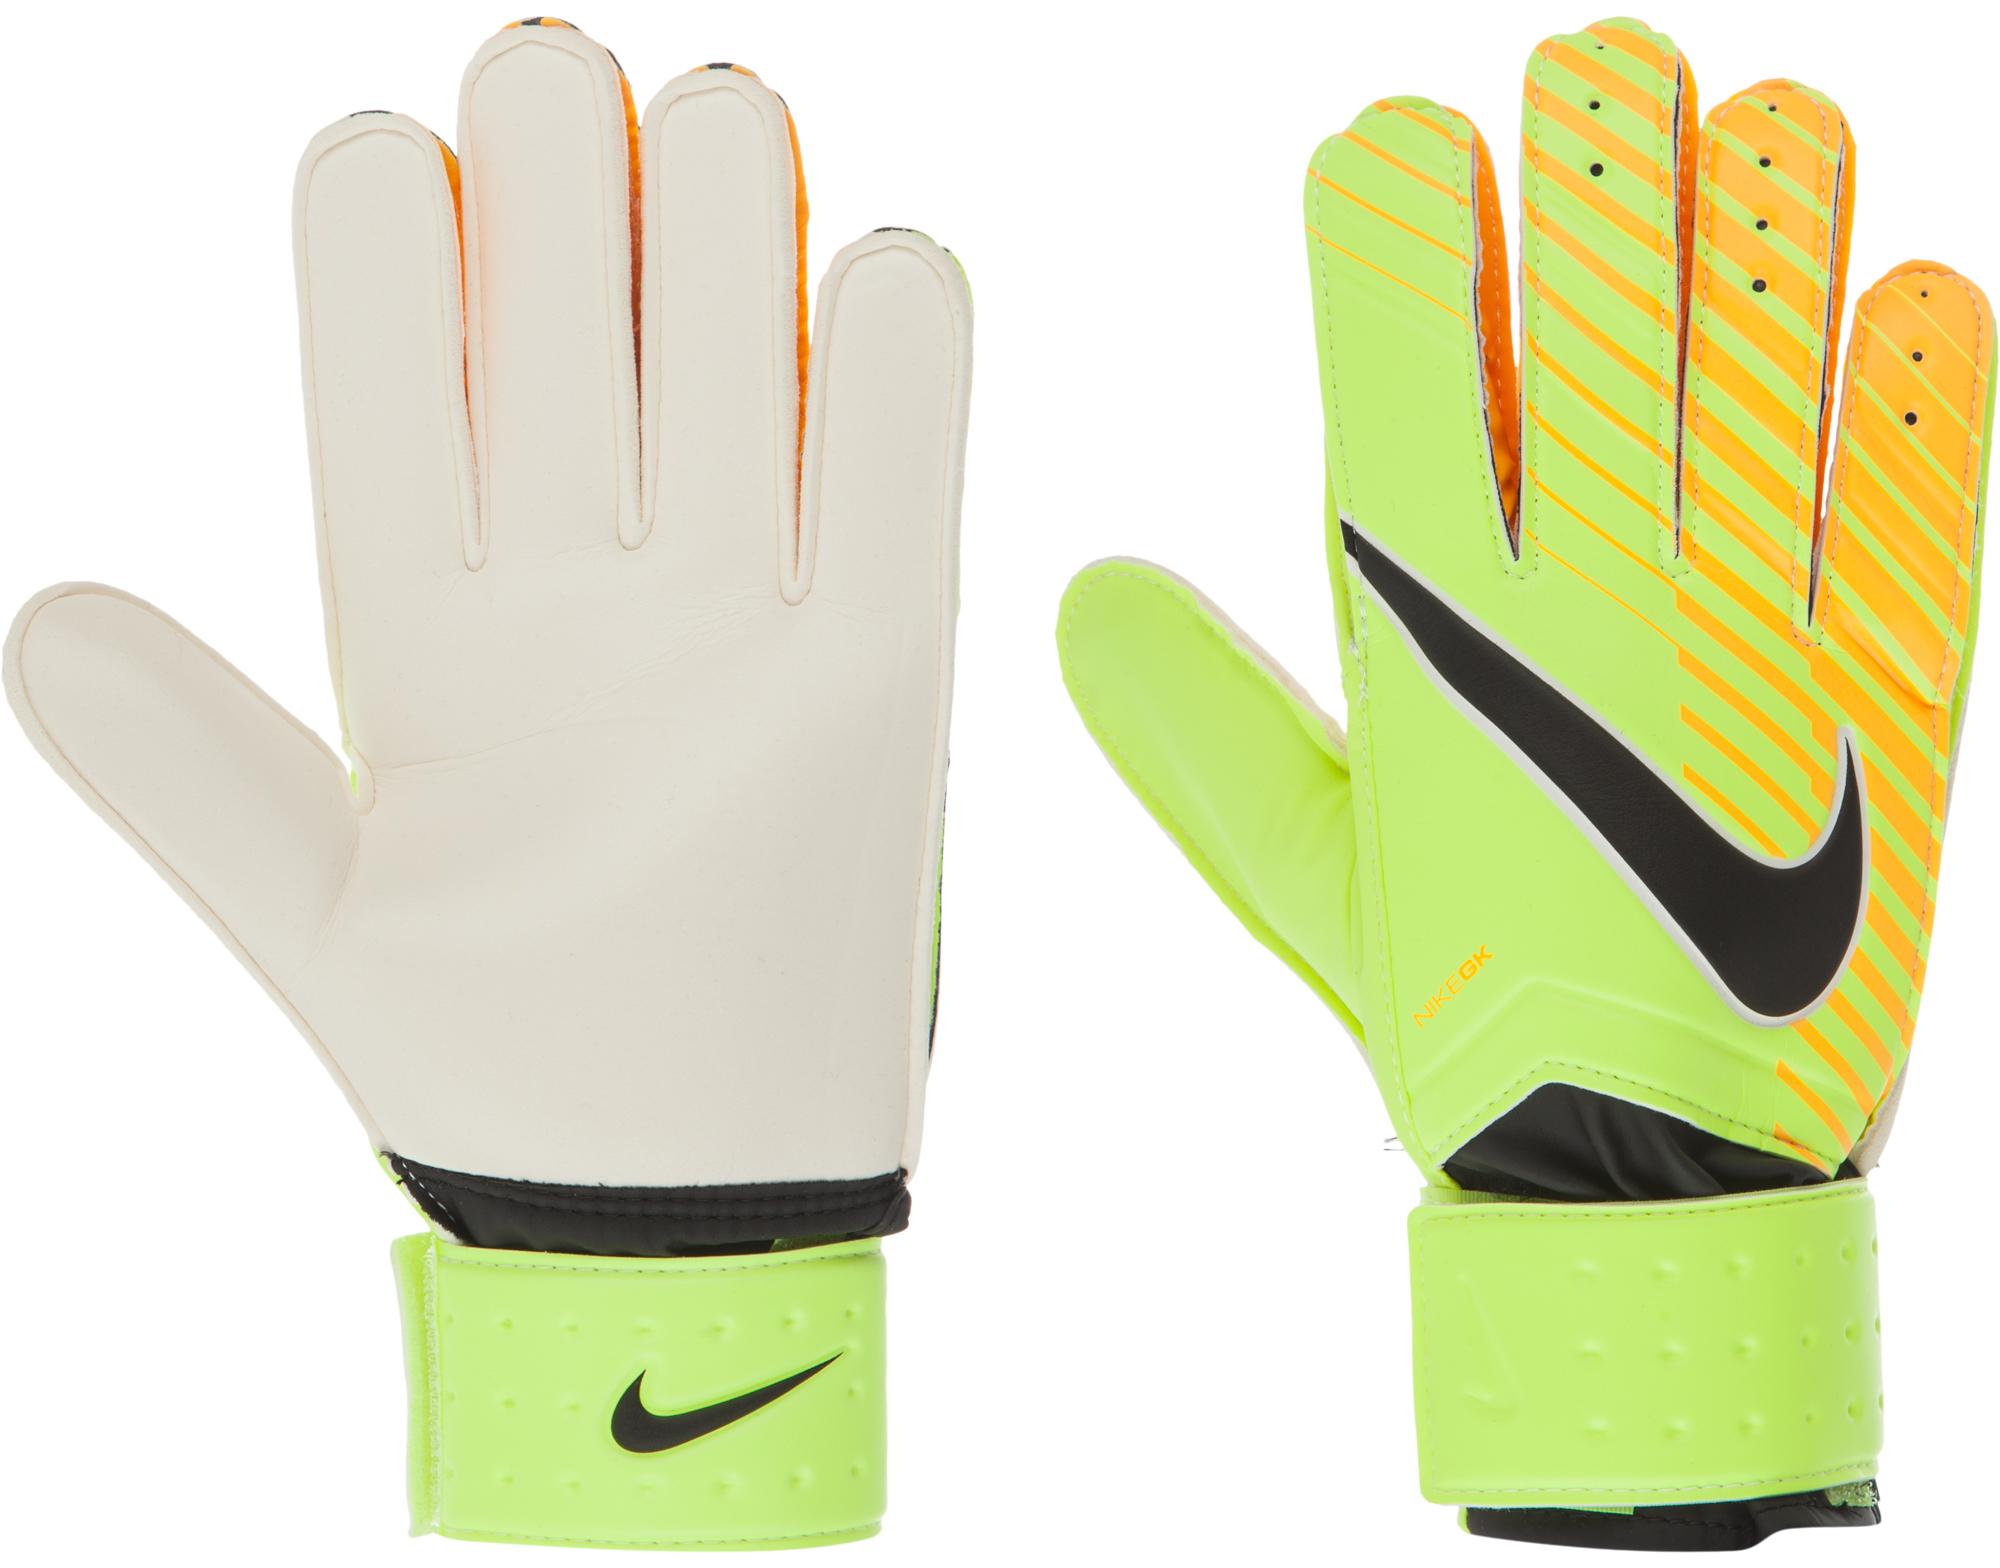 Nike Перчатки вратарские Nike Gk Match вратарские перчатки larsen перчатки вратарские radium